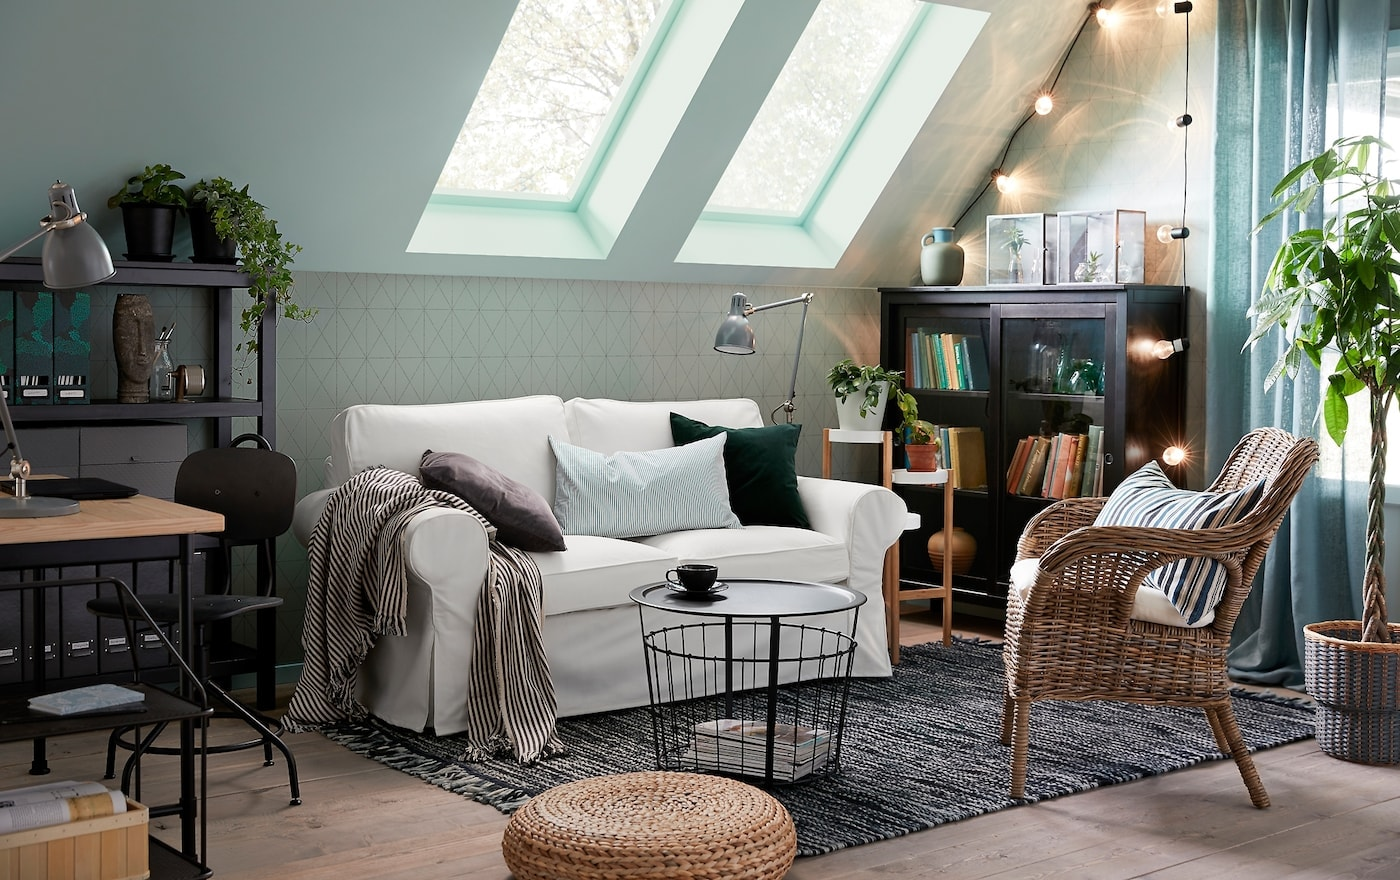 Ikea Living Room >> Living Room Design Ideas Gallery Ikea